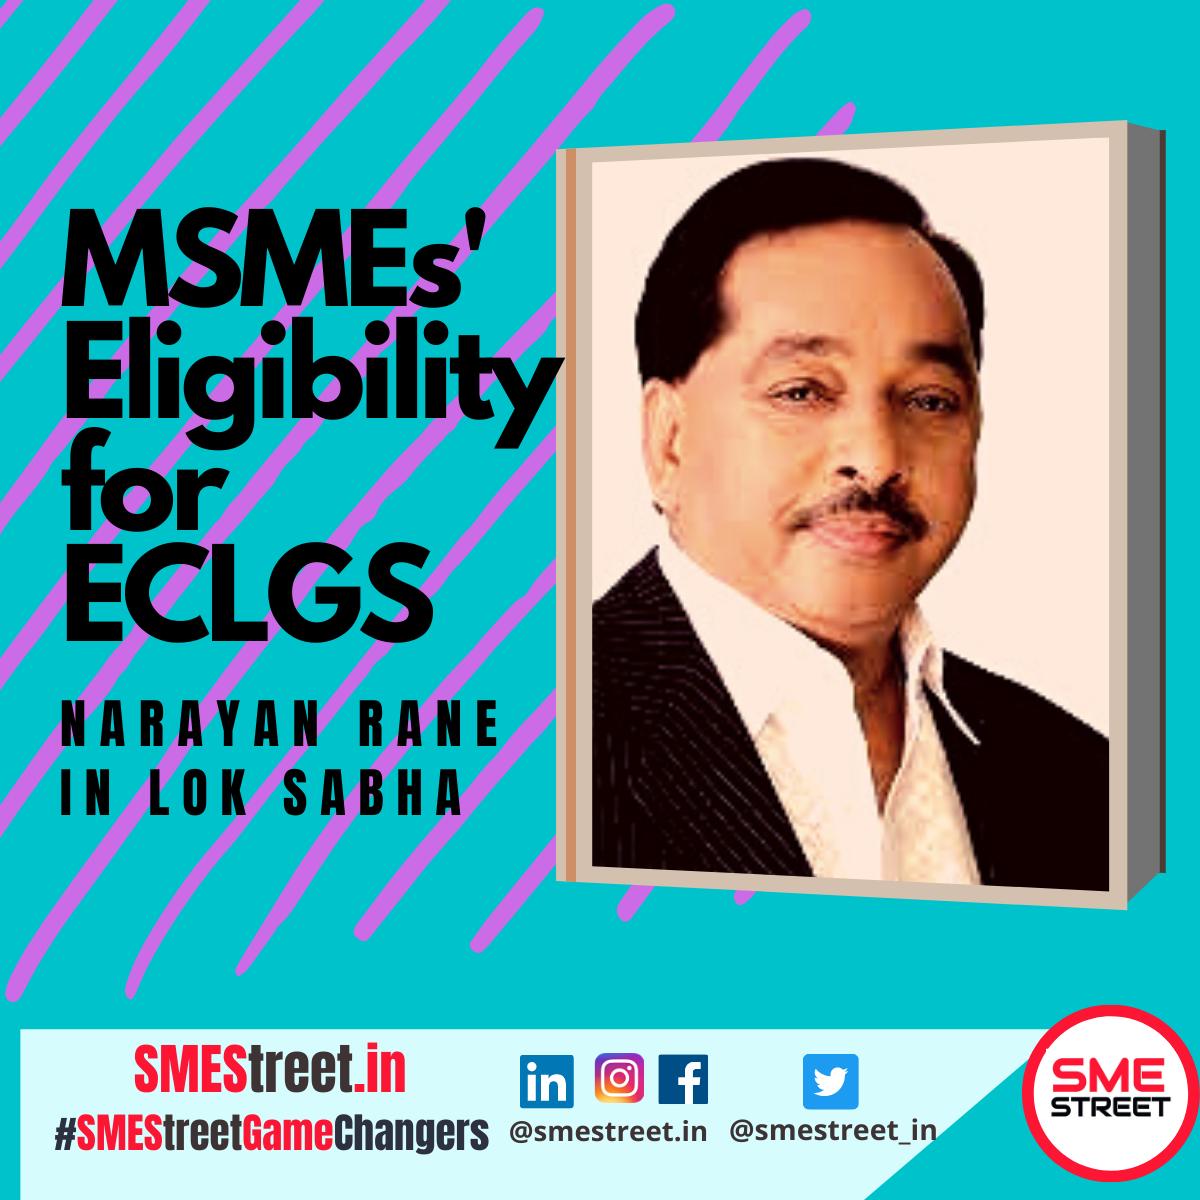 MSMEs' Eligibility for ECLGS, Narayan Rane, MSMEs, SMEStreet, ECGLS